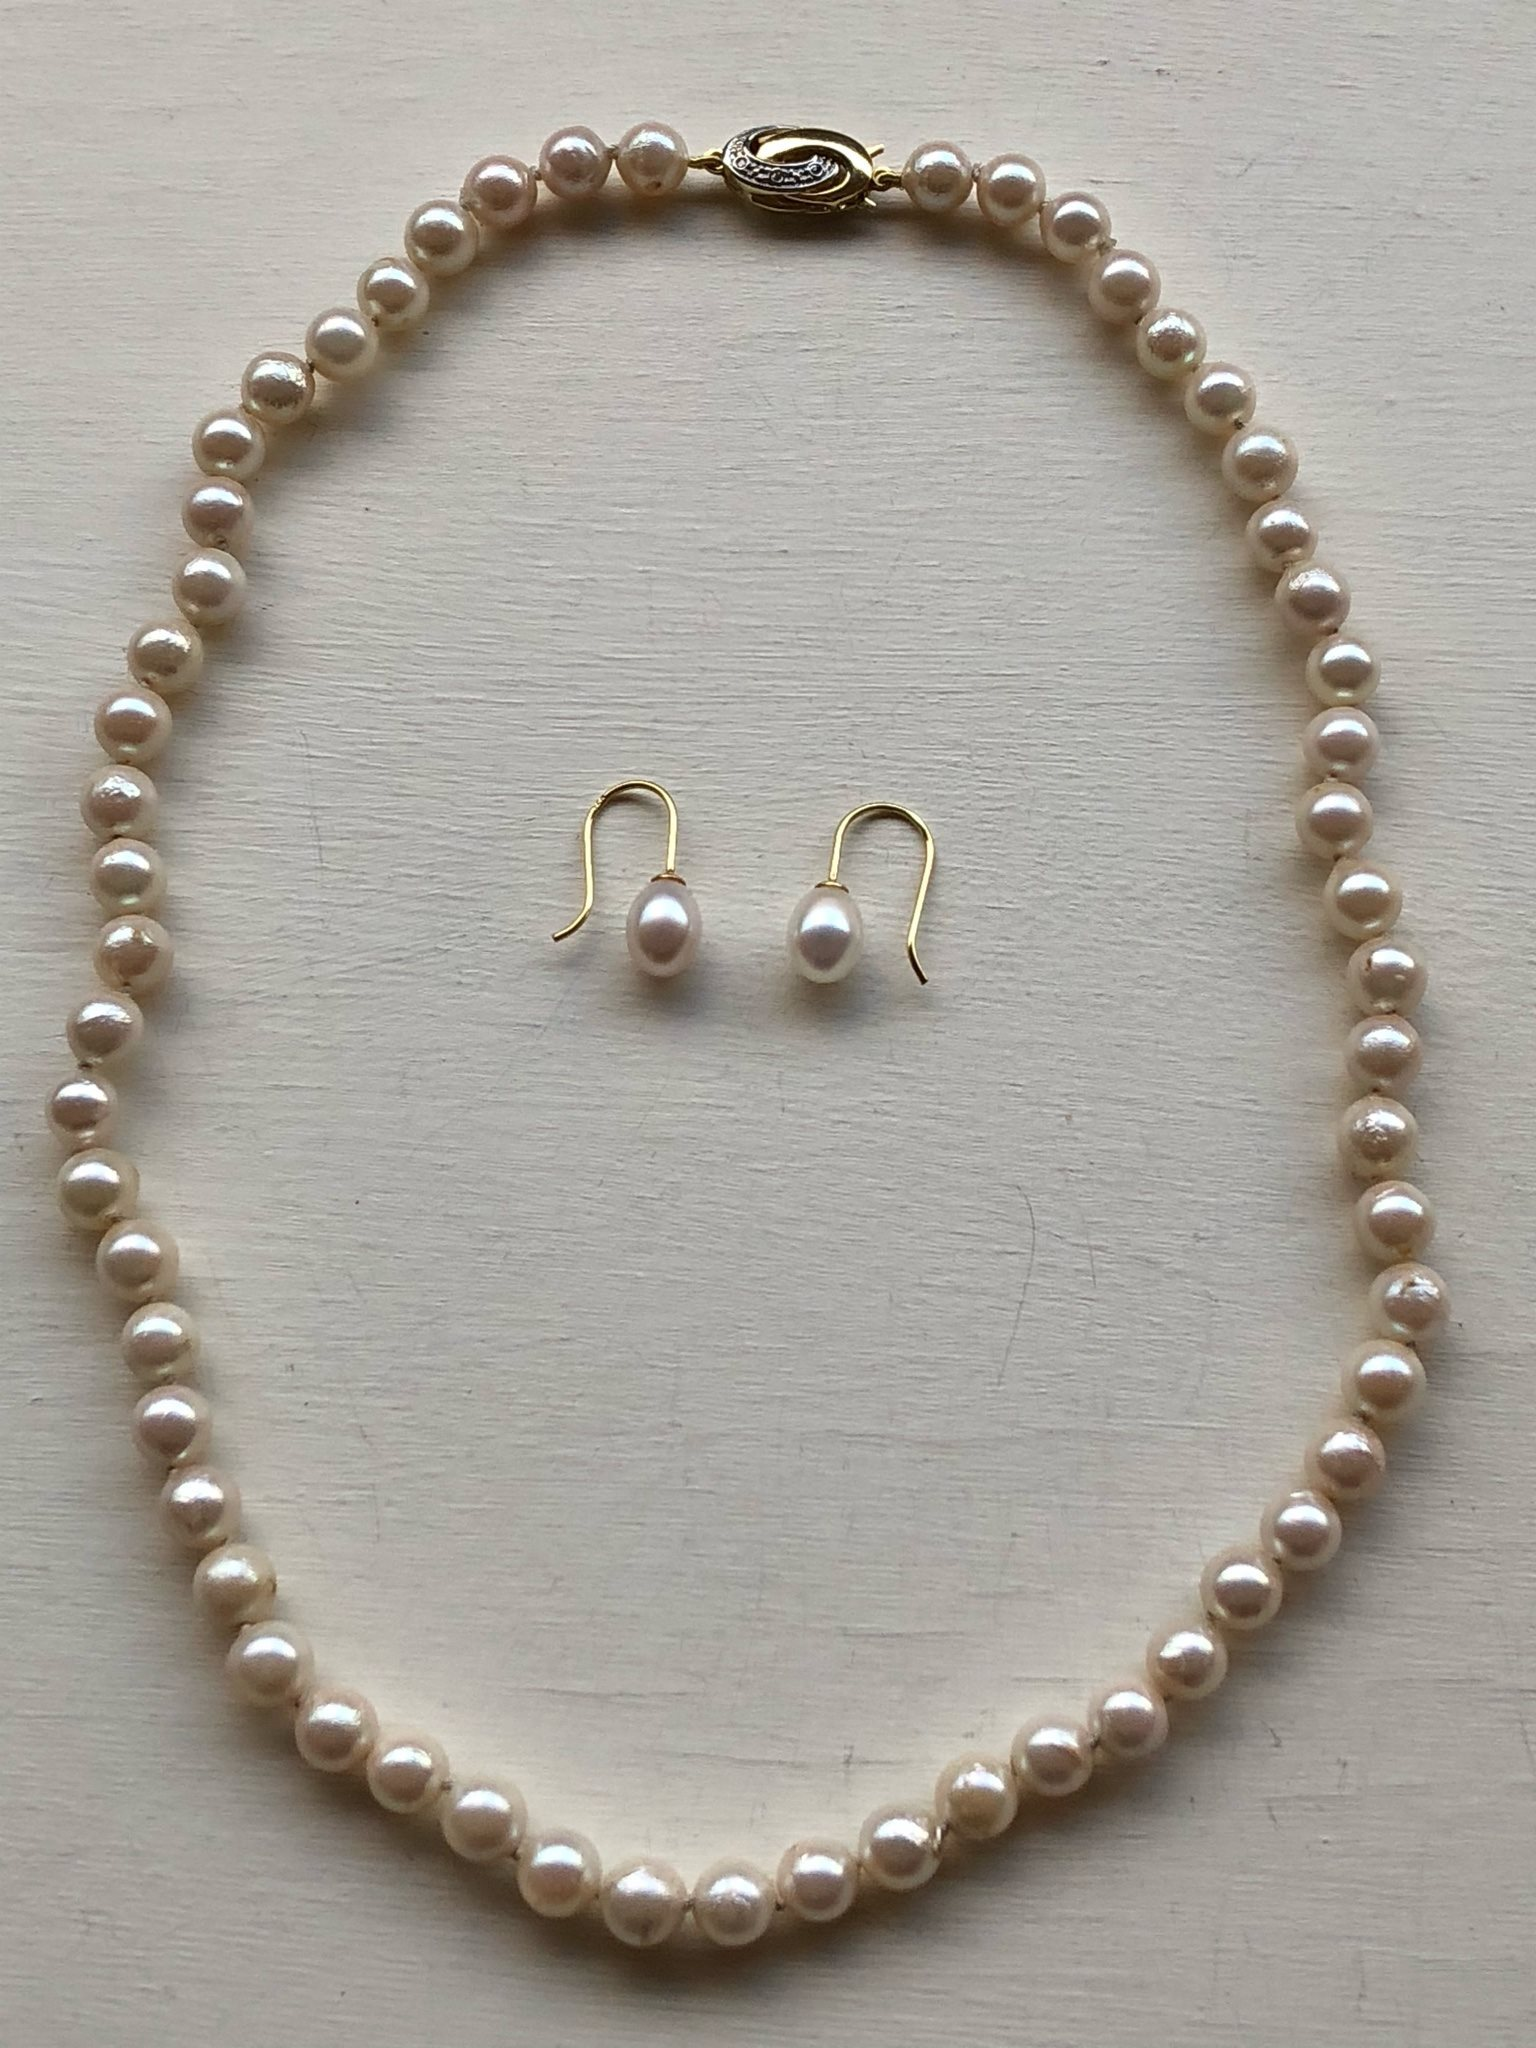 pärlcollier odlade pärlor